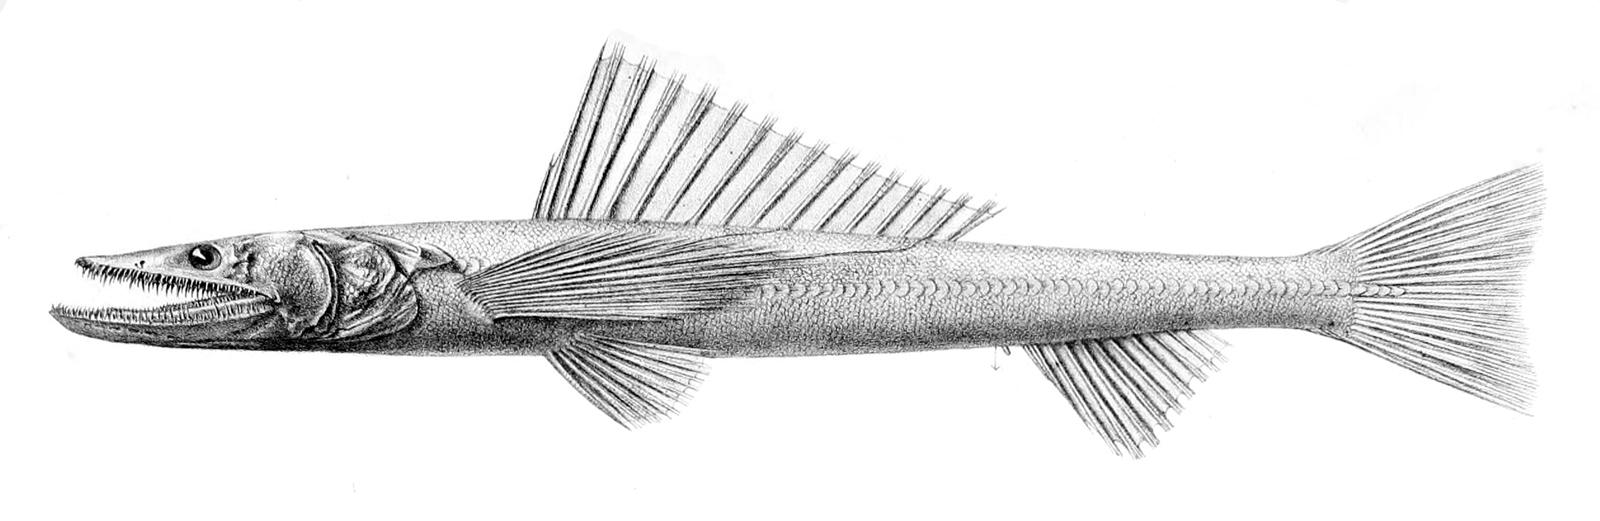 Image of Deep-sea Lizardfish